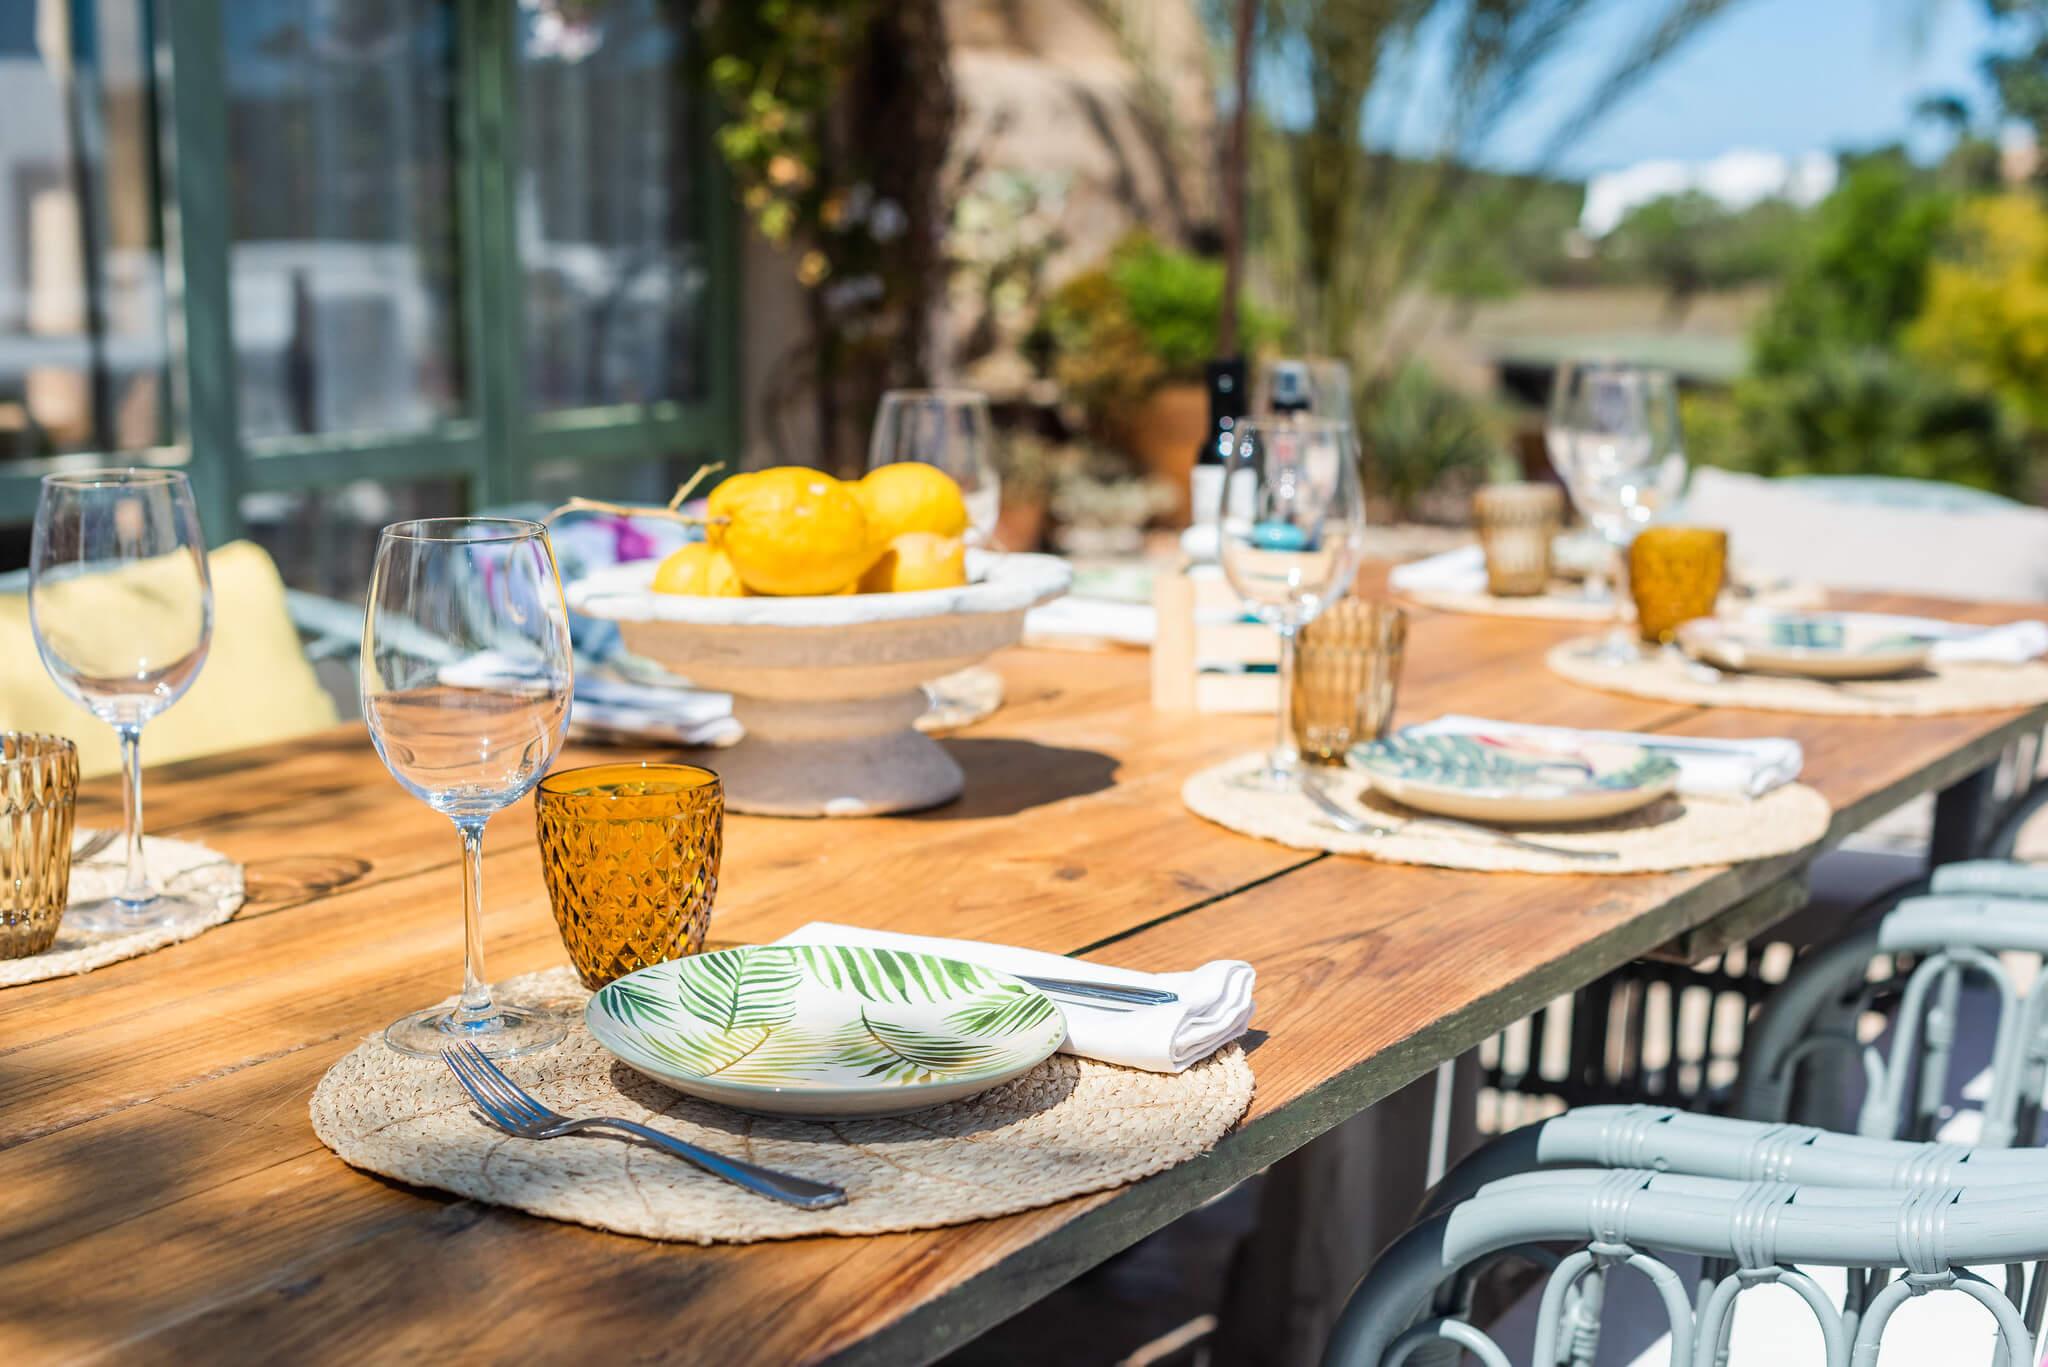 https://www.white-ibiza.com/wp-content/uploads/2020/03/white-ibiza-restaurants-es-cucons-02.jpg